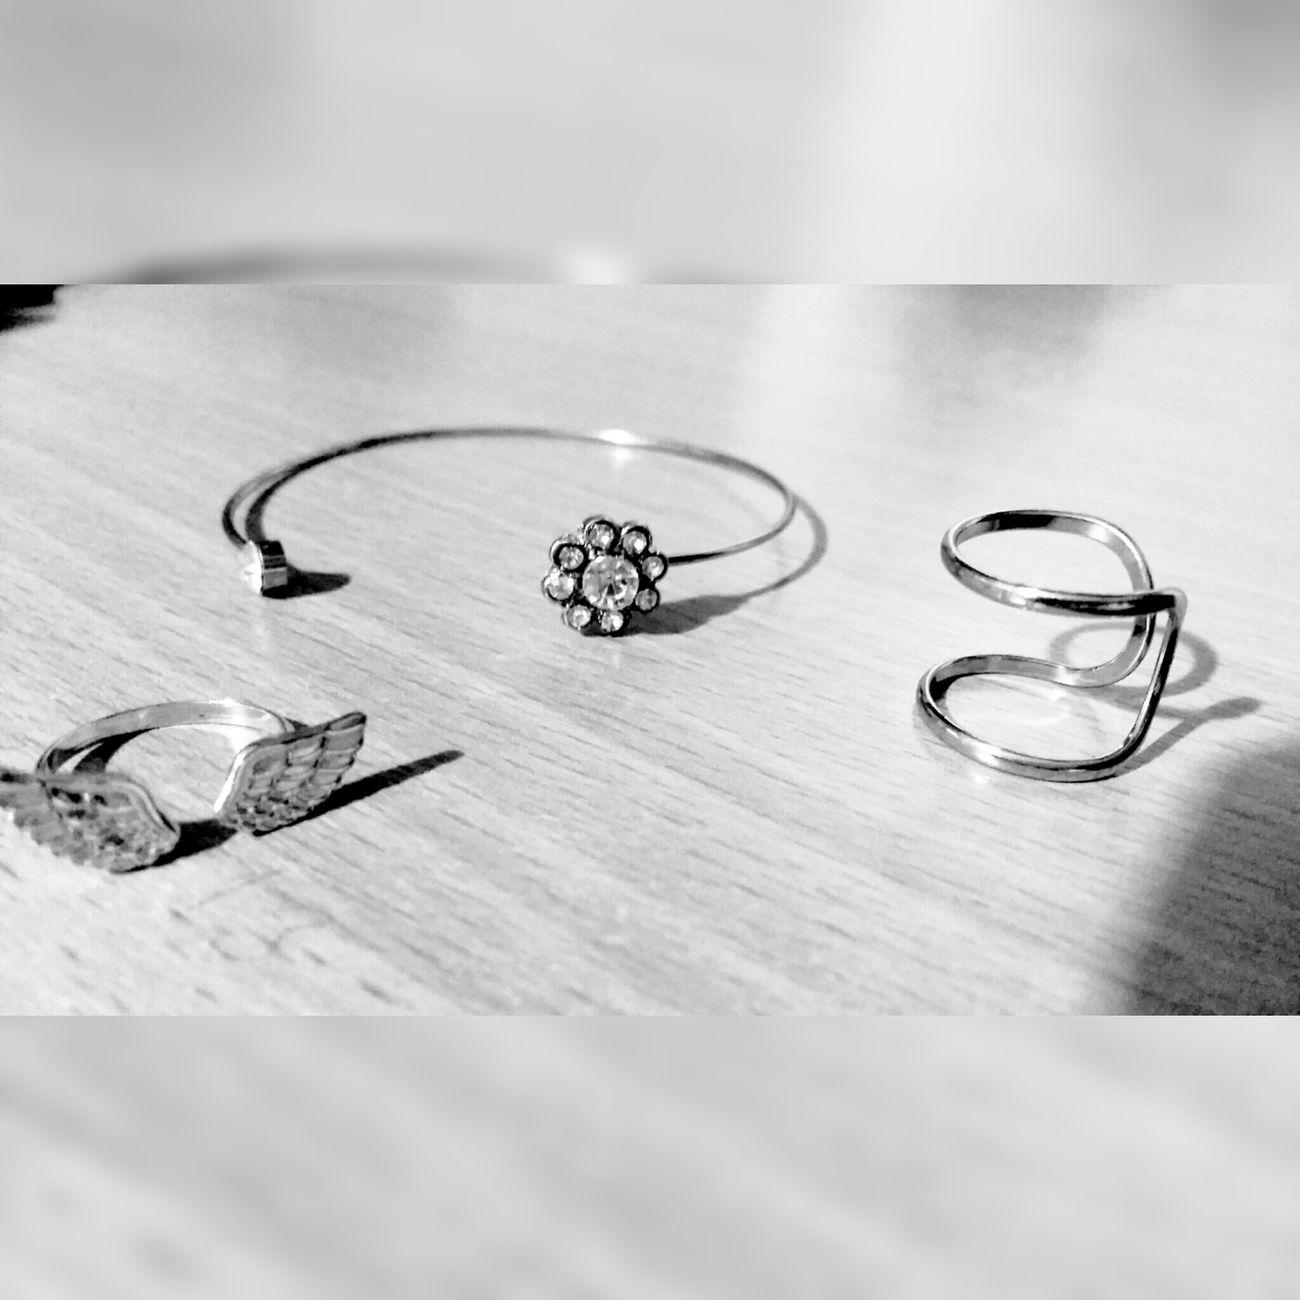 Fashionblogger Fashion&love&beauty Fashion&style Likeforlike #likemyphoto #qlikemyphotos #like4like #likemypic #likeback #ilikeback #10likes #50likes #100likes #20likes #likere Fashion Forever Urban Fashion Jewelry Jewellery💎 Silver  Diamonds Elegance Everywhere Shick Likesforlikes Ameteur Photography